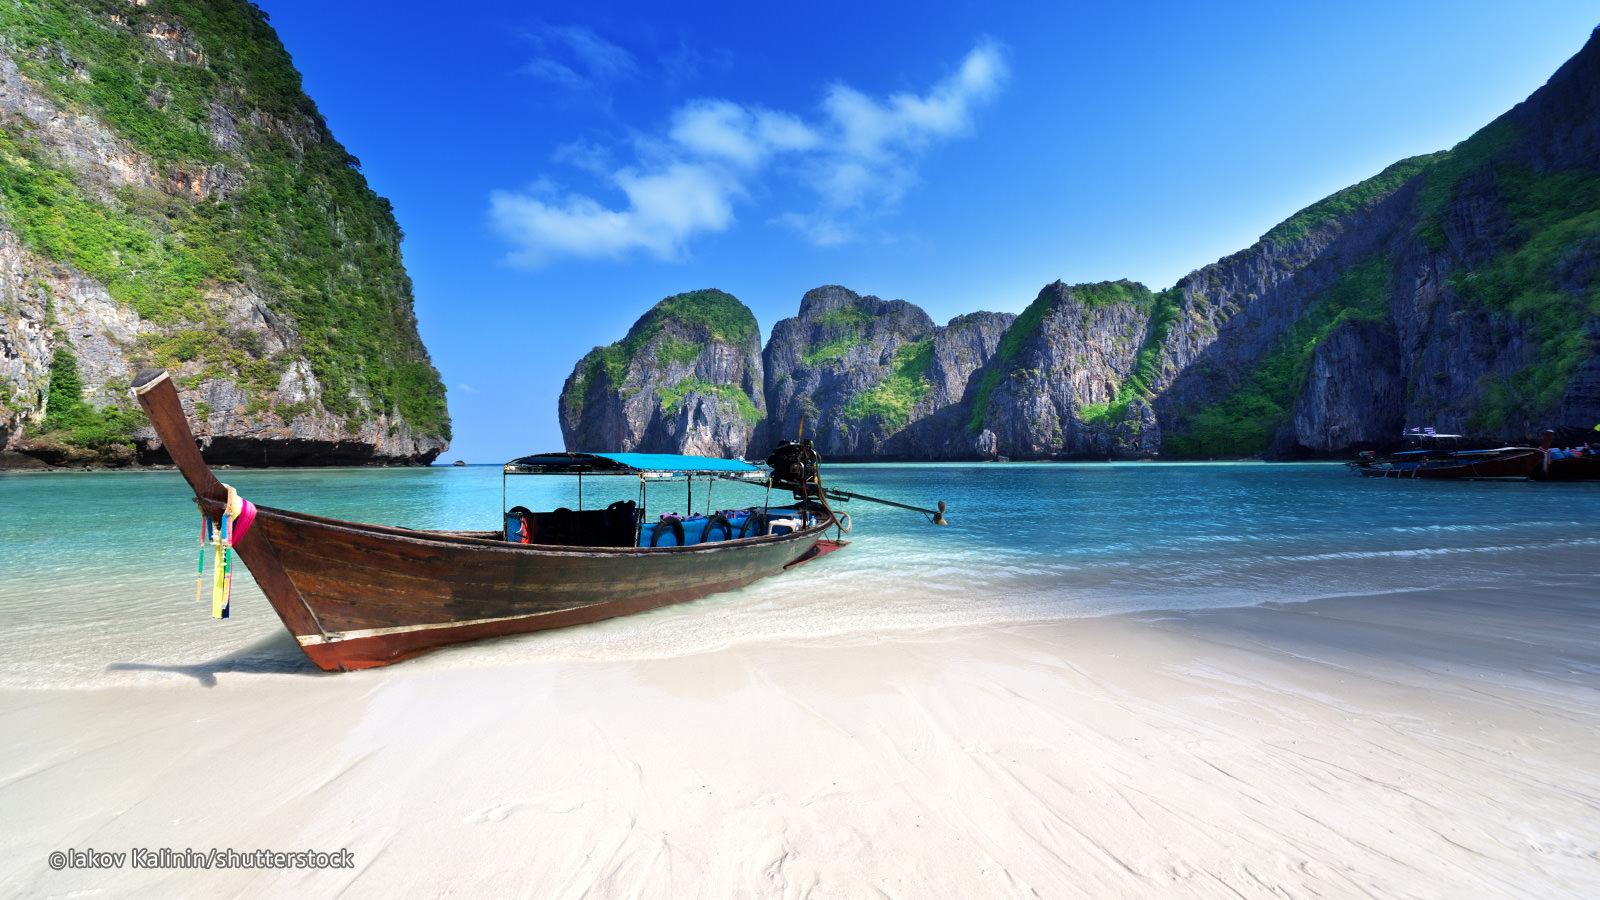 New York to Bangkok or Phuket Thailand $383-$393 RT Airfares on China Southern Airlines (Travel January-March 2020)